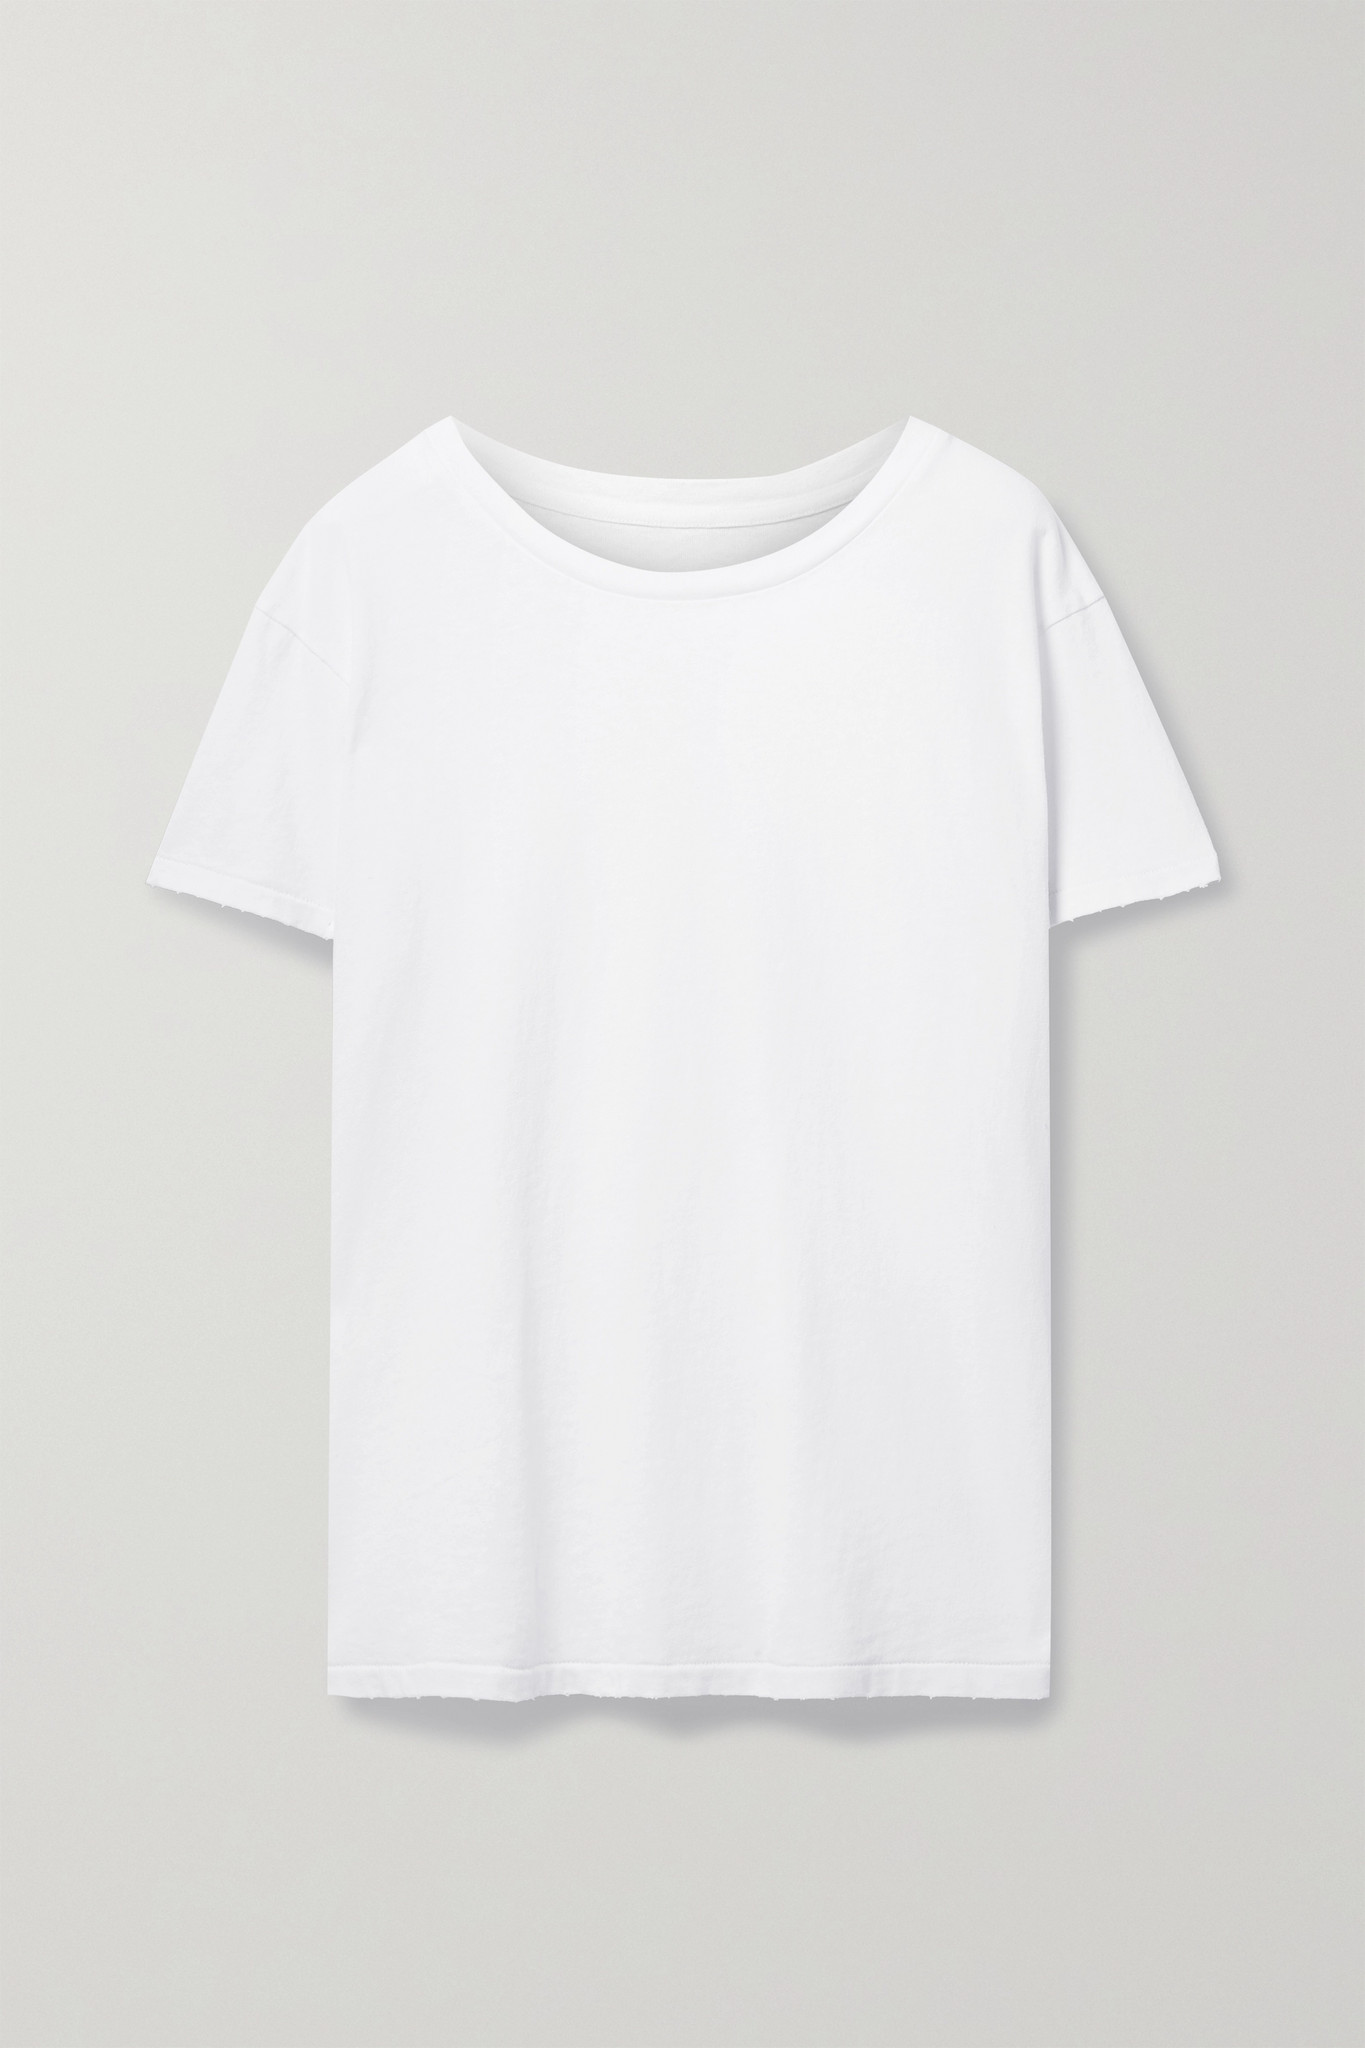 NILI LOTAN - Brady 仿旧纯棉平纹布 T 恤 - 白色 - x small